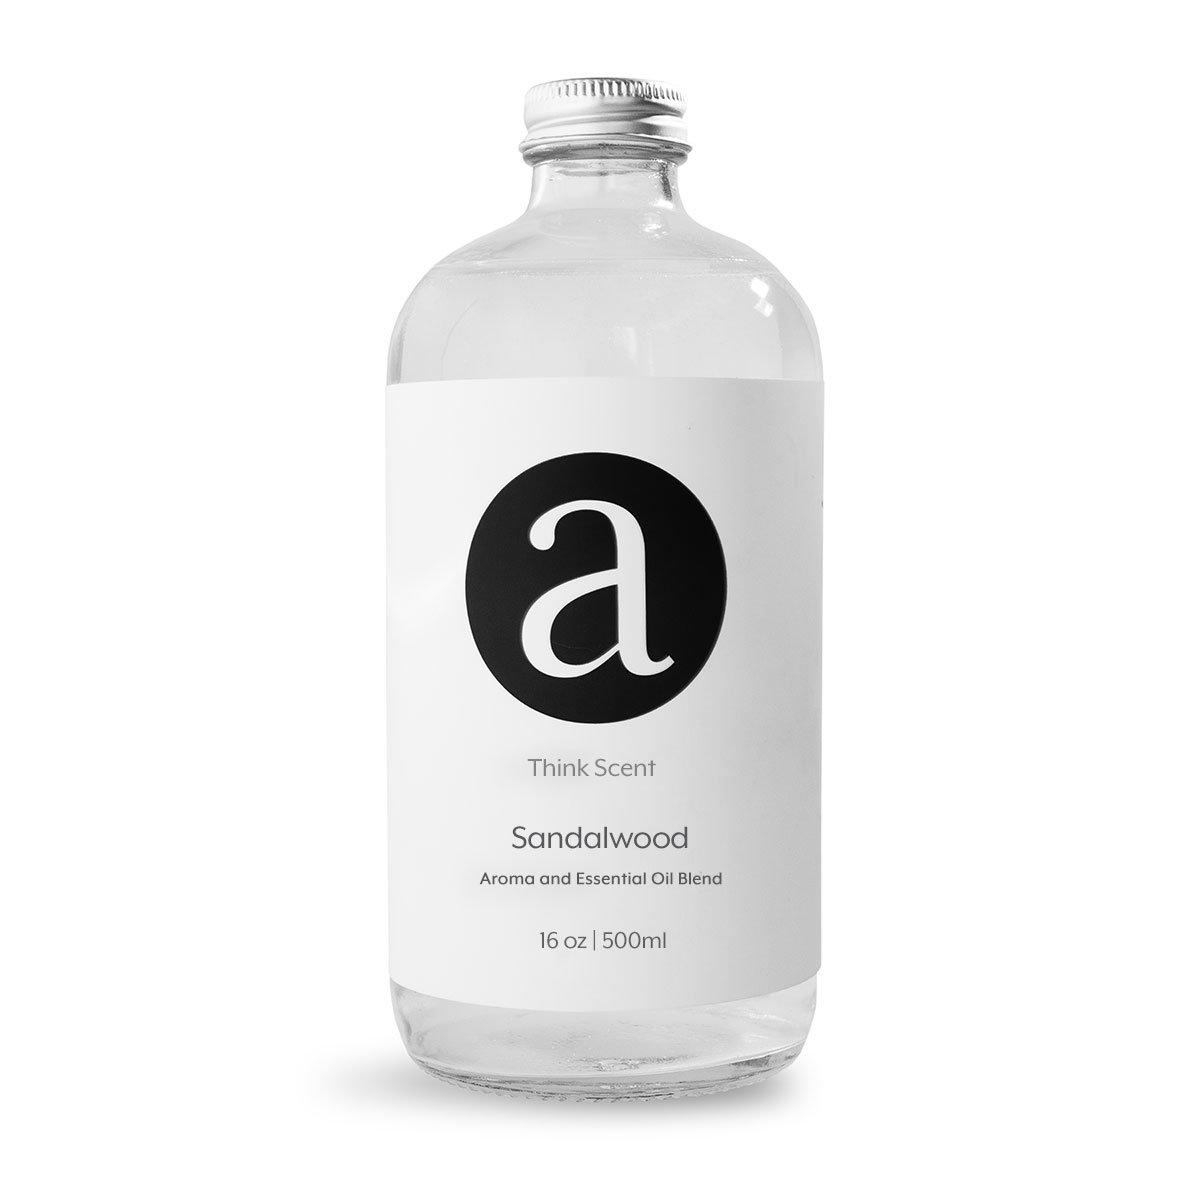 (Sandalwood) Aroma / Fragrance Oil For AromaTech Air Freshener Scent Diffuser (Half Gallon)